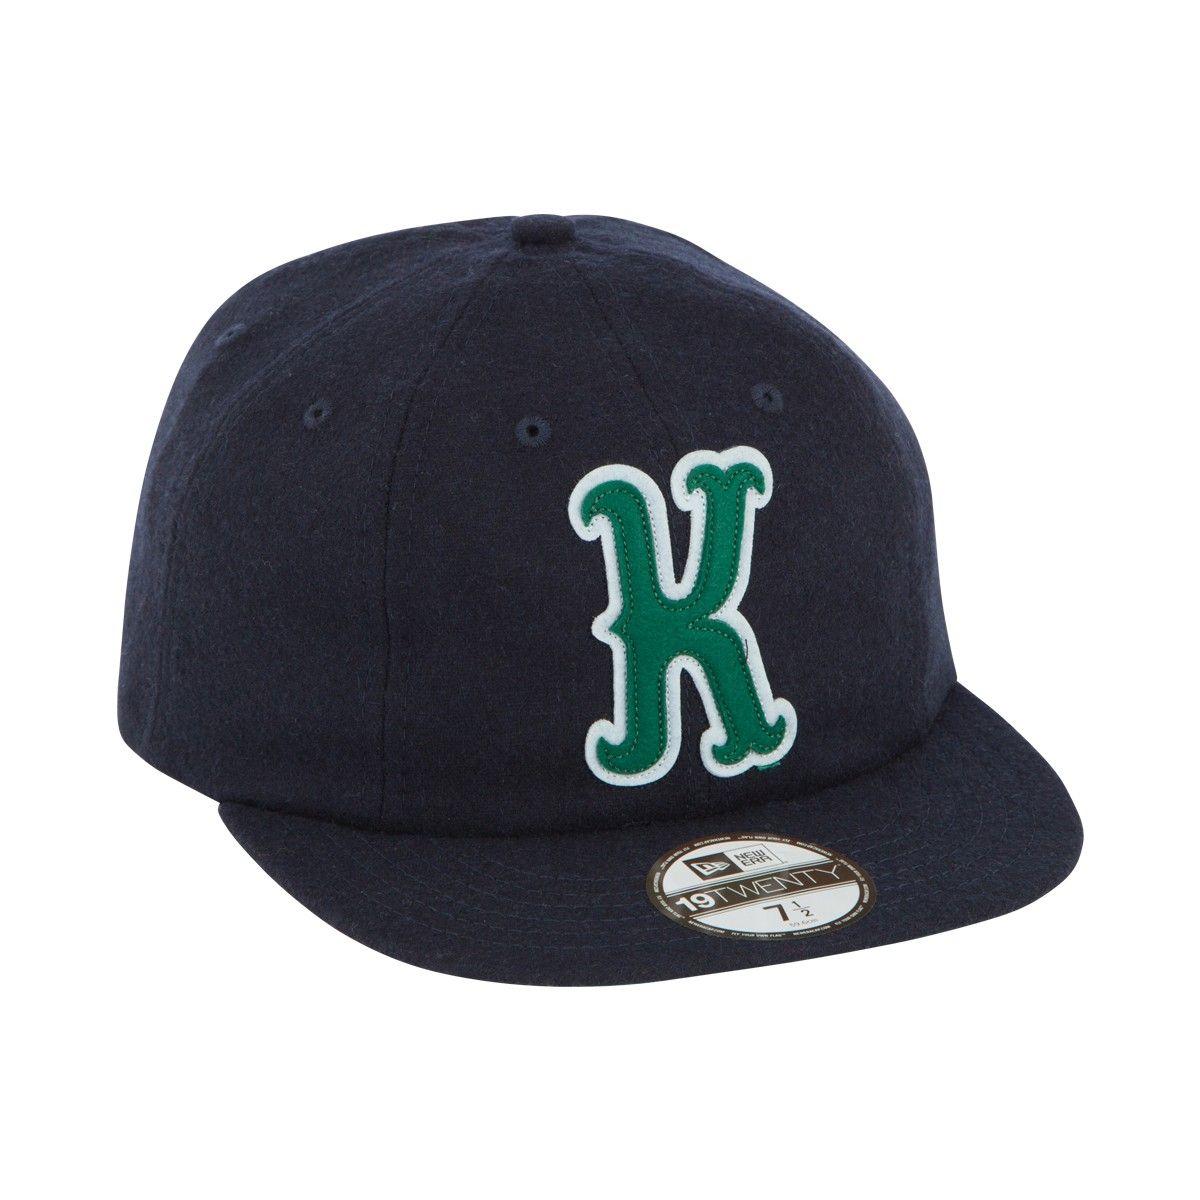 Maison Kitsune PARISIEN 8 PANEL CAP - NEW ERA Fitted Baseball Caps fecef1ba4f8e